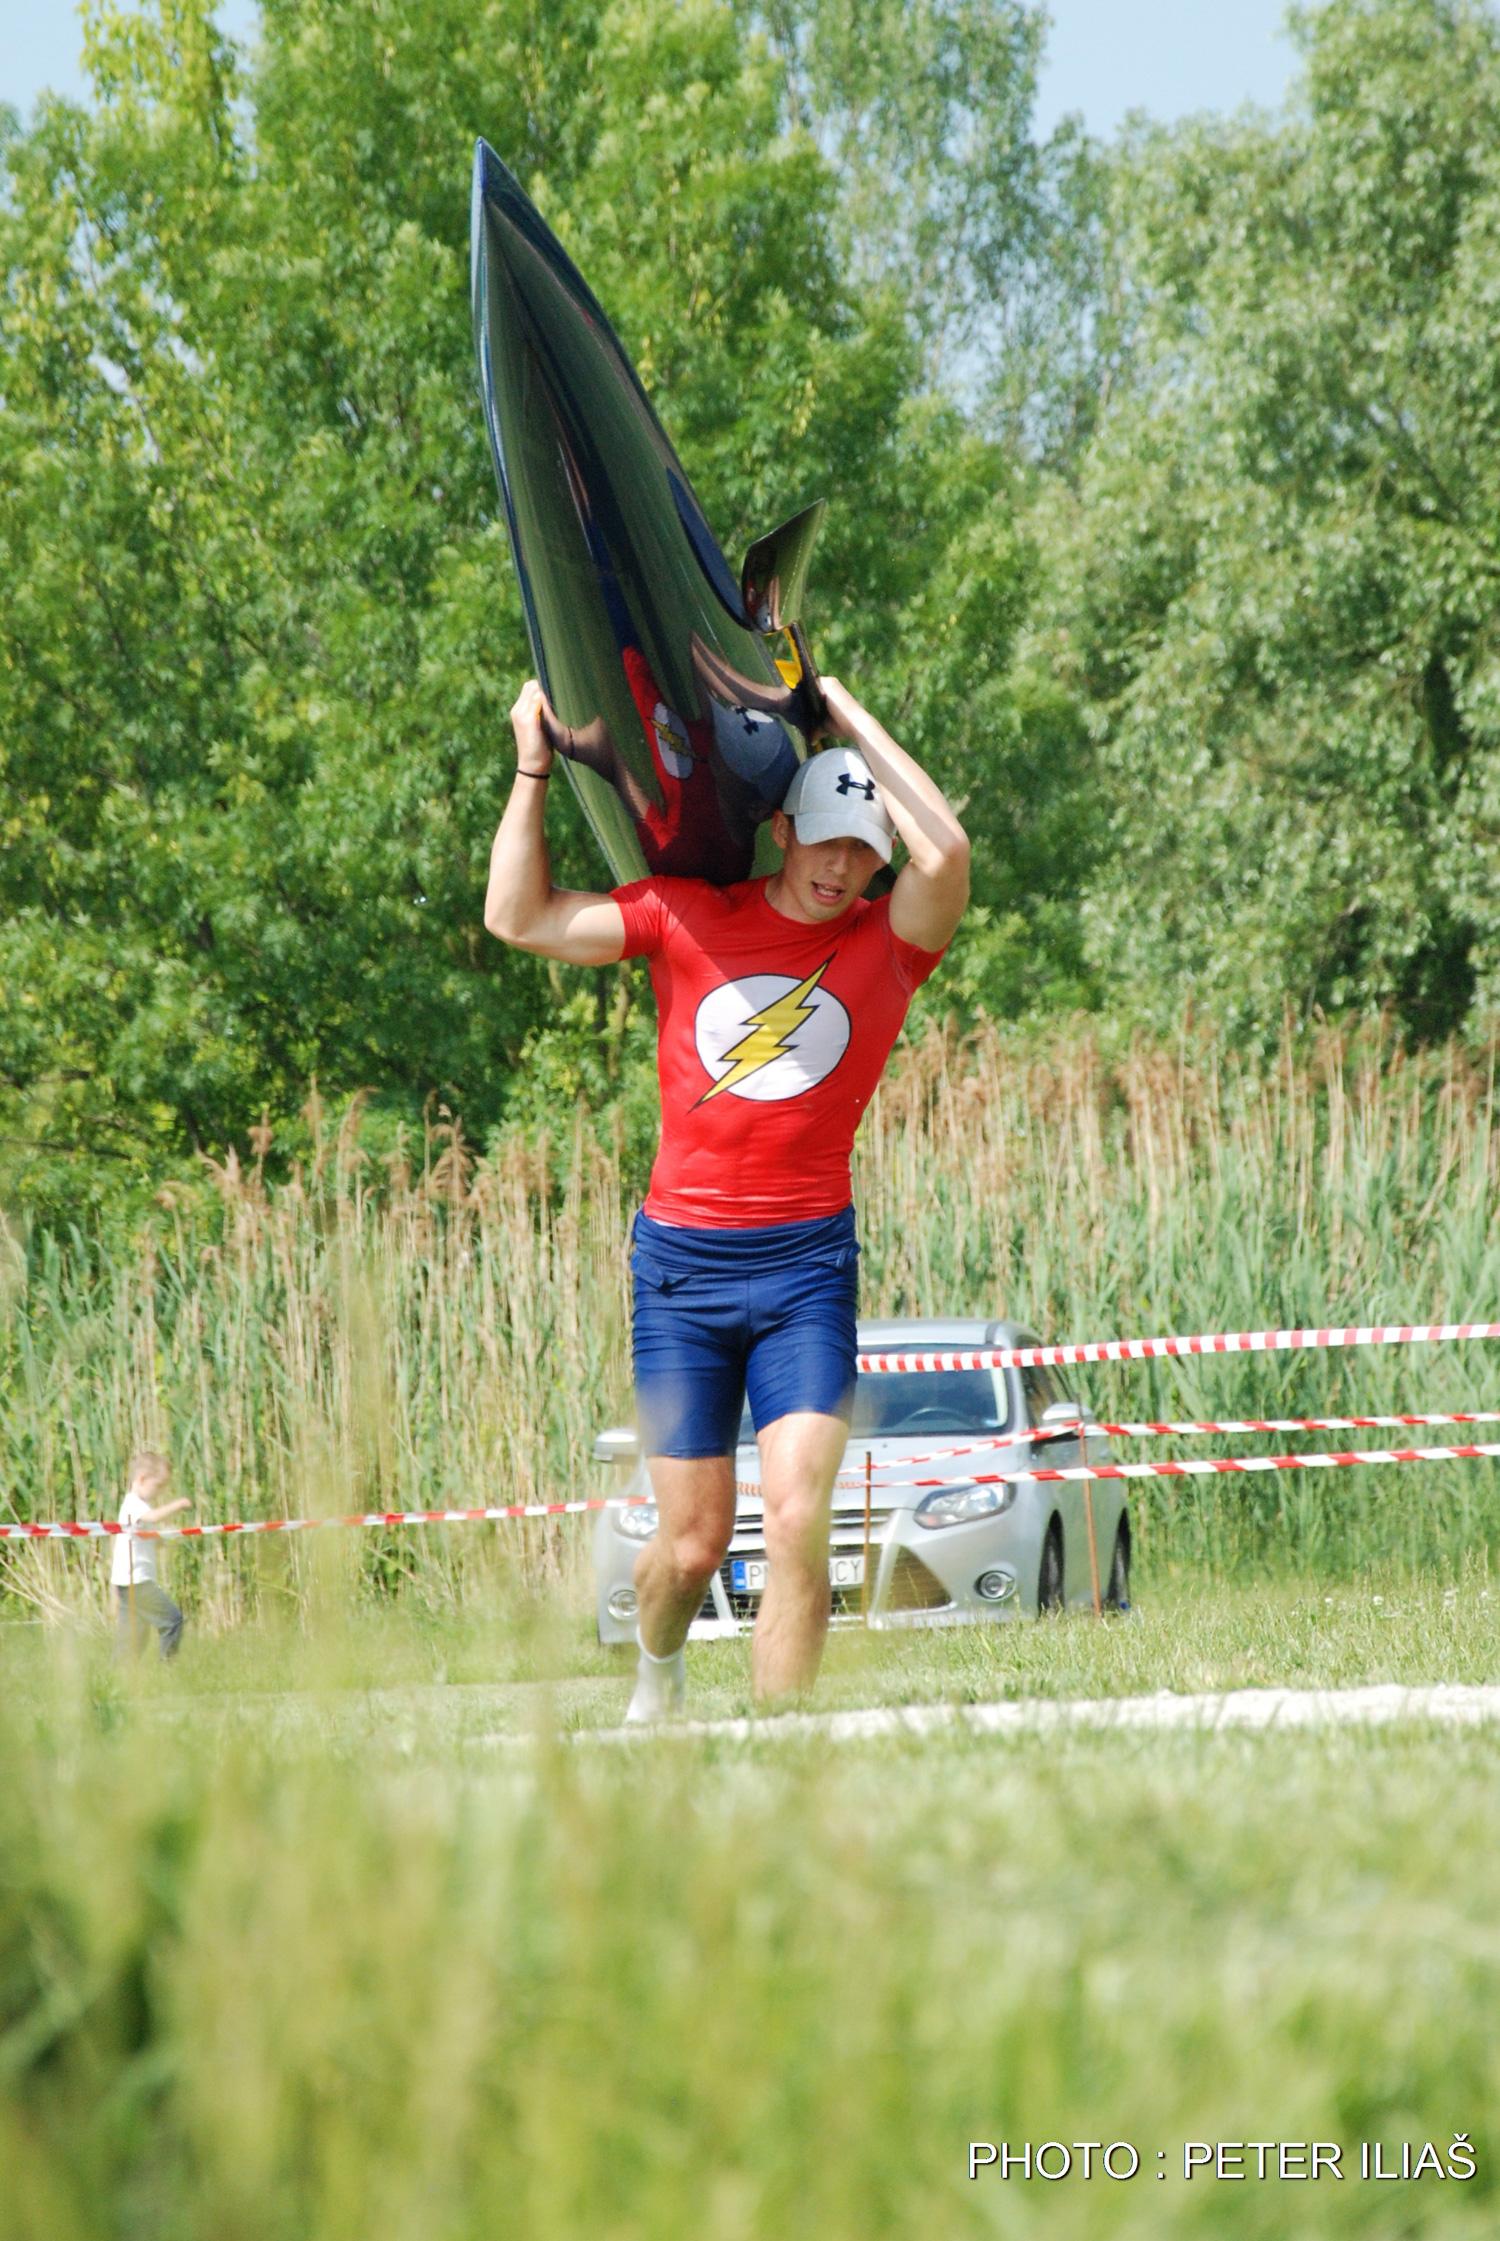 Majstrovstvá Slovenska v maratóne - fotka